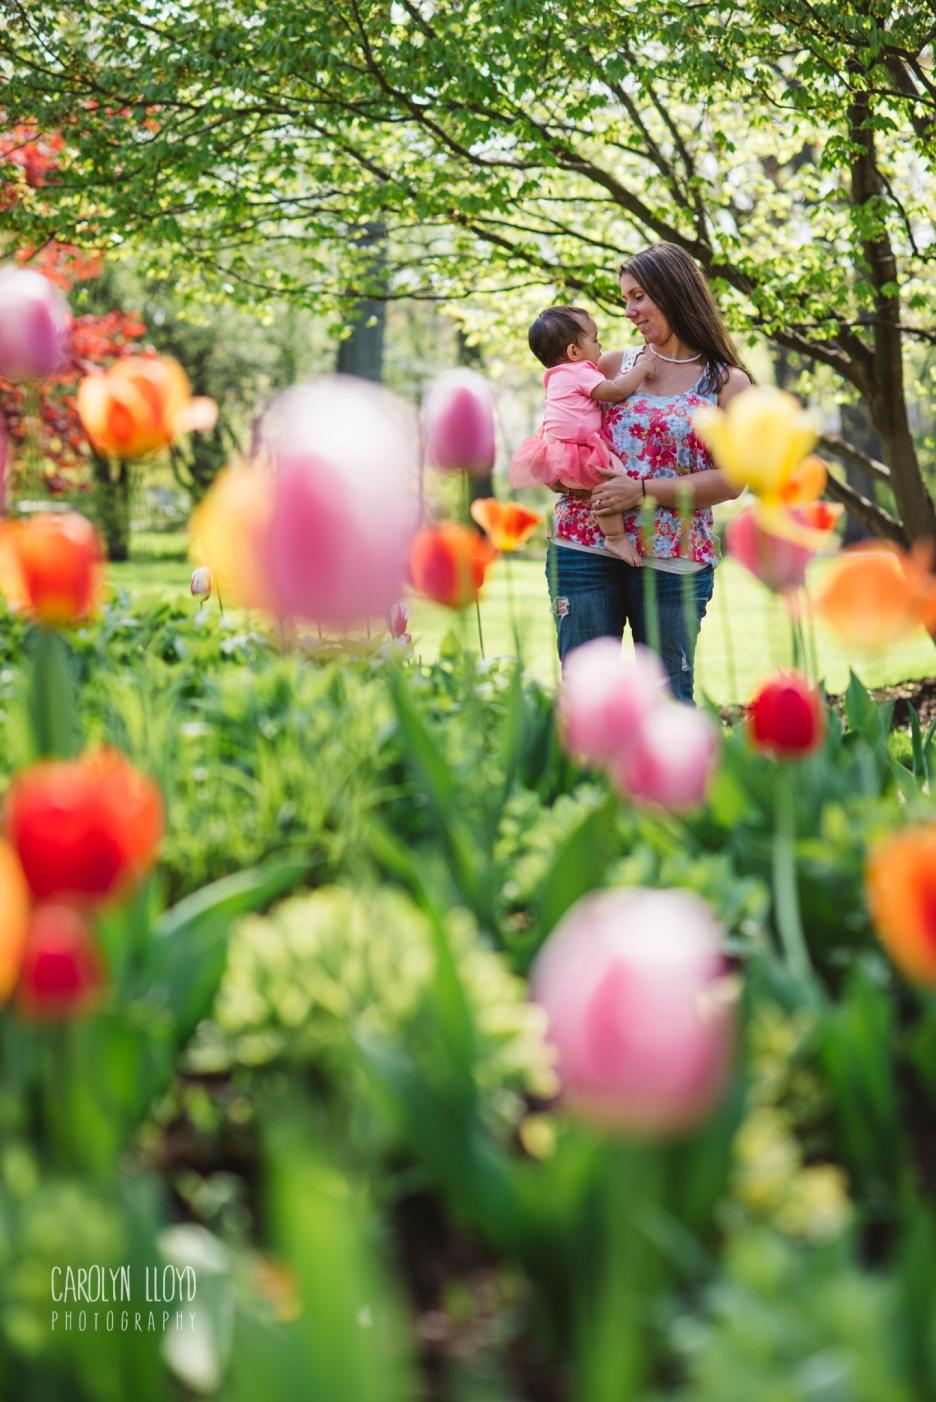 CLP_Carmella_tulips